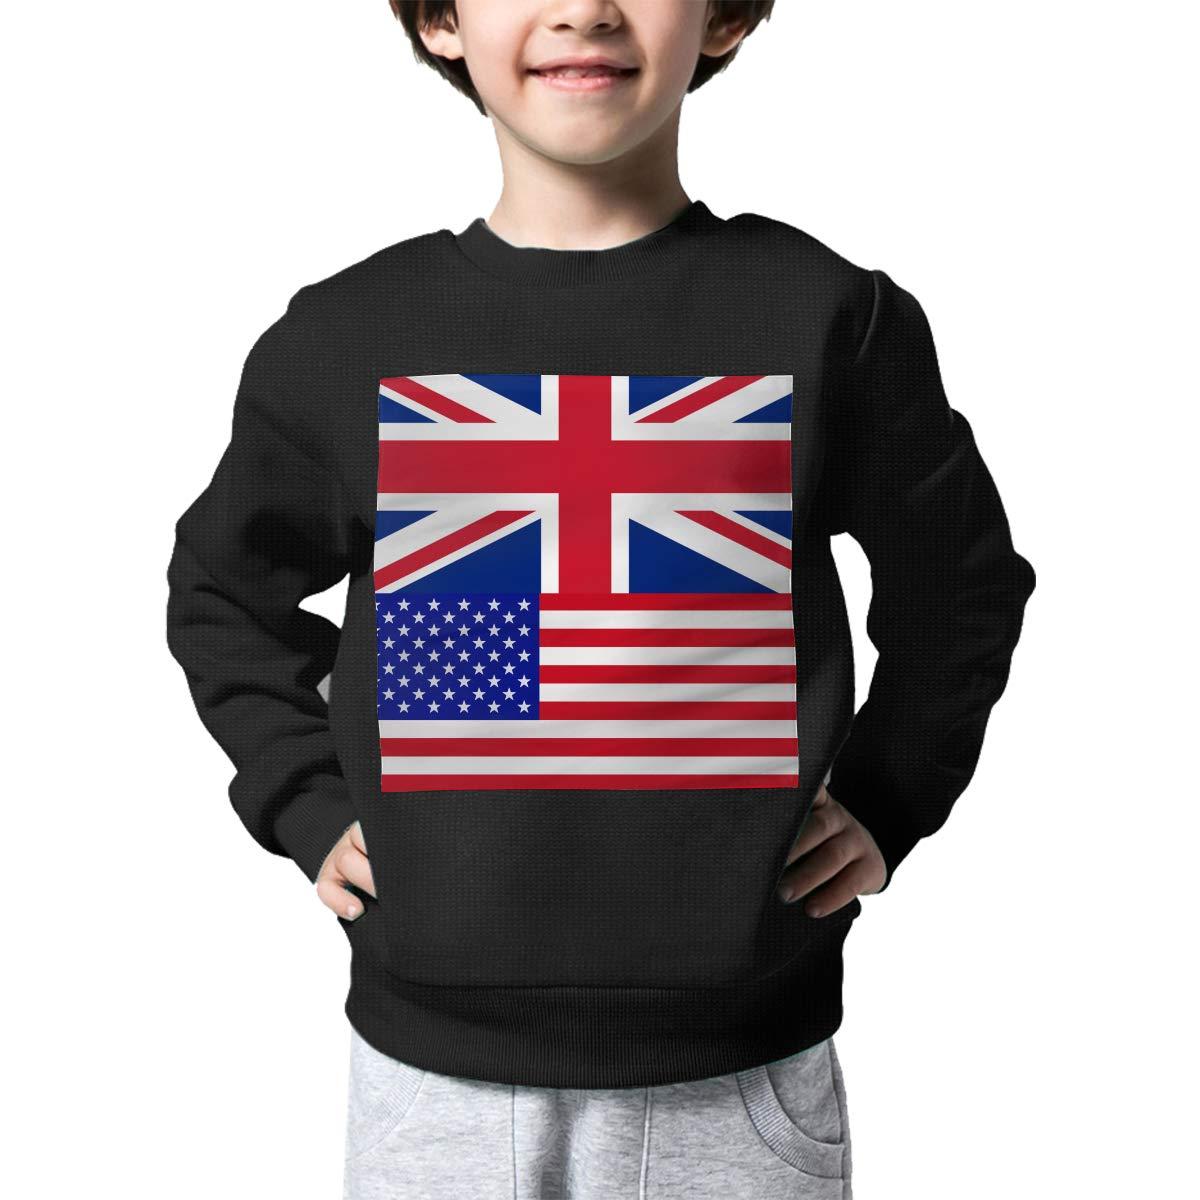 NJKM5MJ Boys Girls British-American Proud Lovely Sweaters Soft Warm Kids Sweater